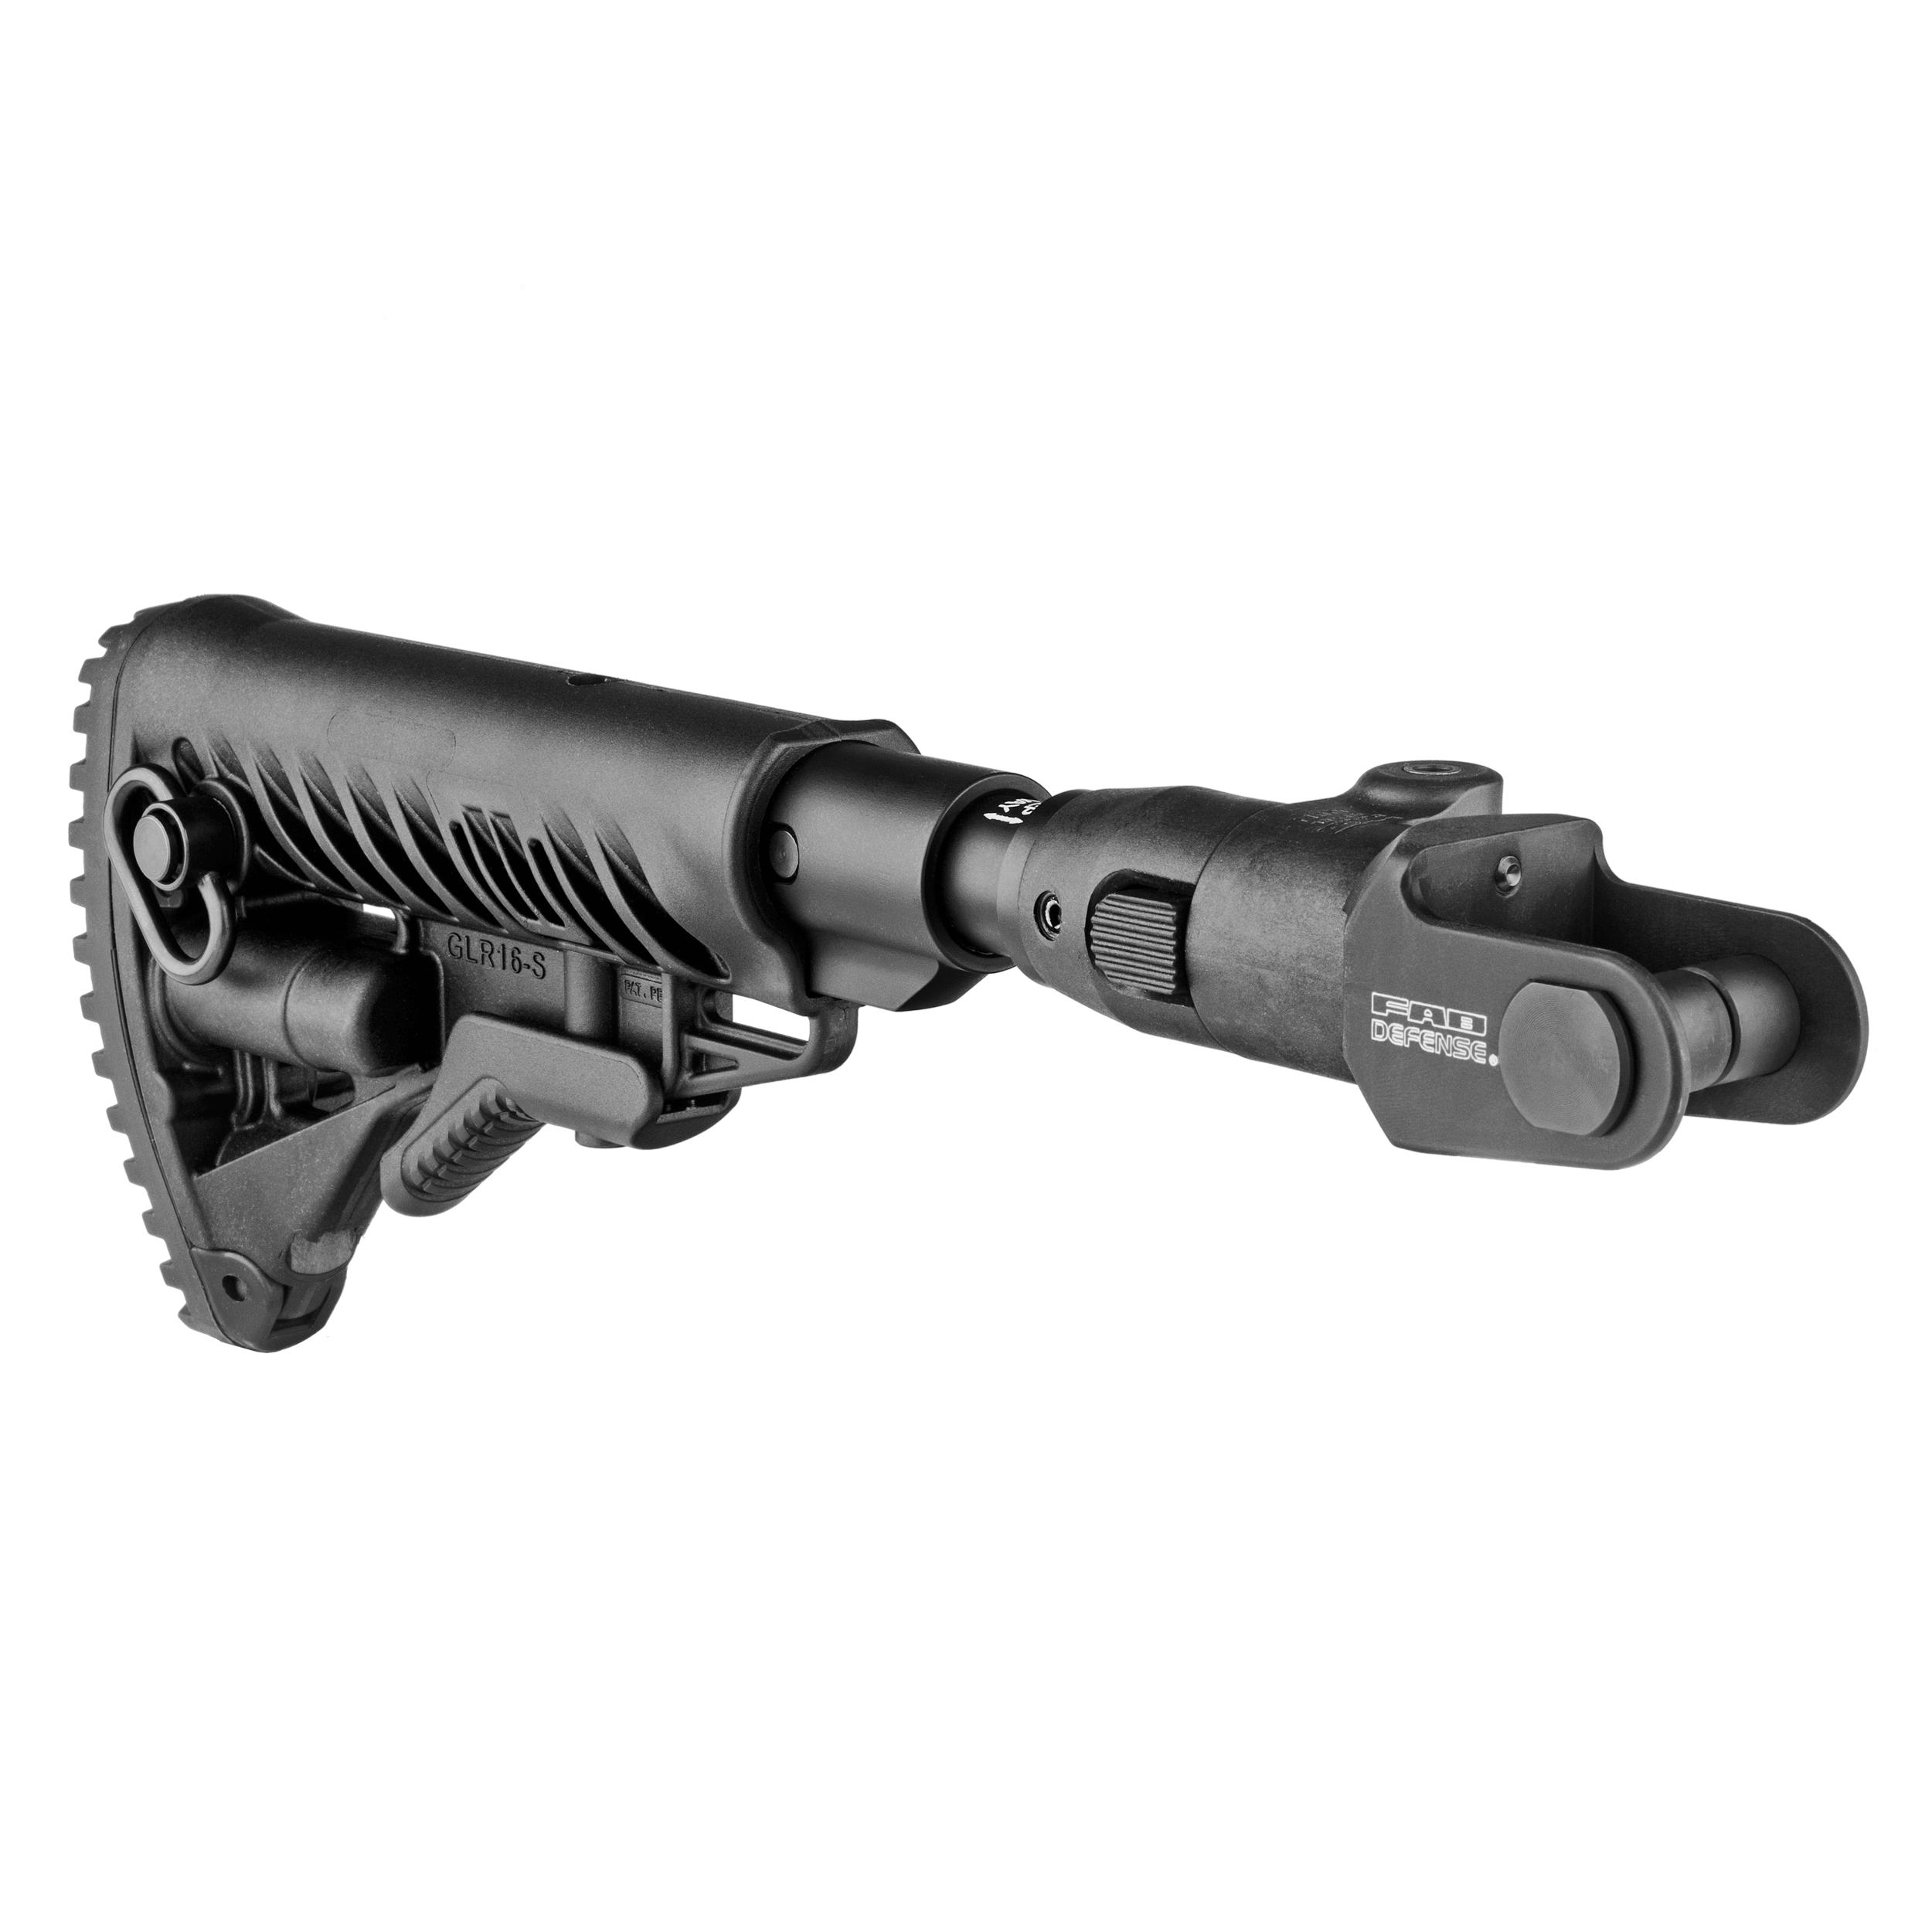 AKMS Folding Collapsible Buttstock /  Shock Absorber (underfolder)